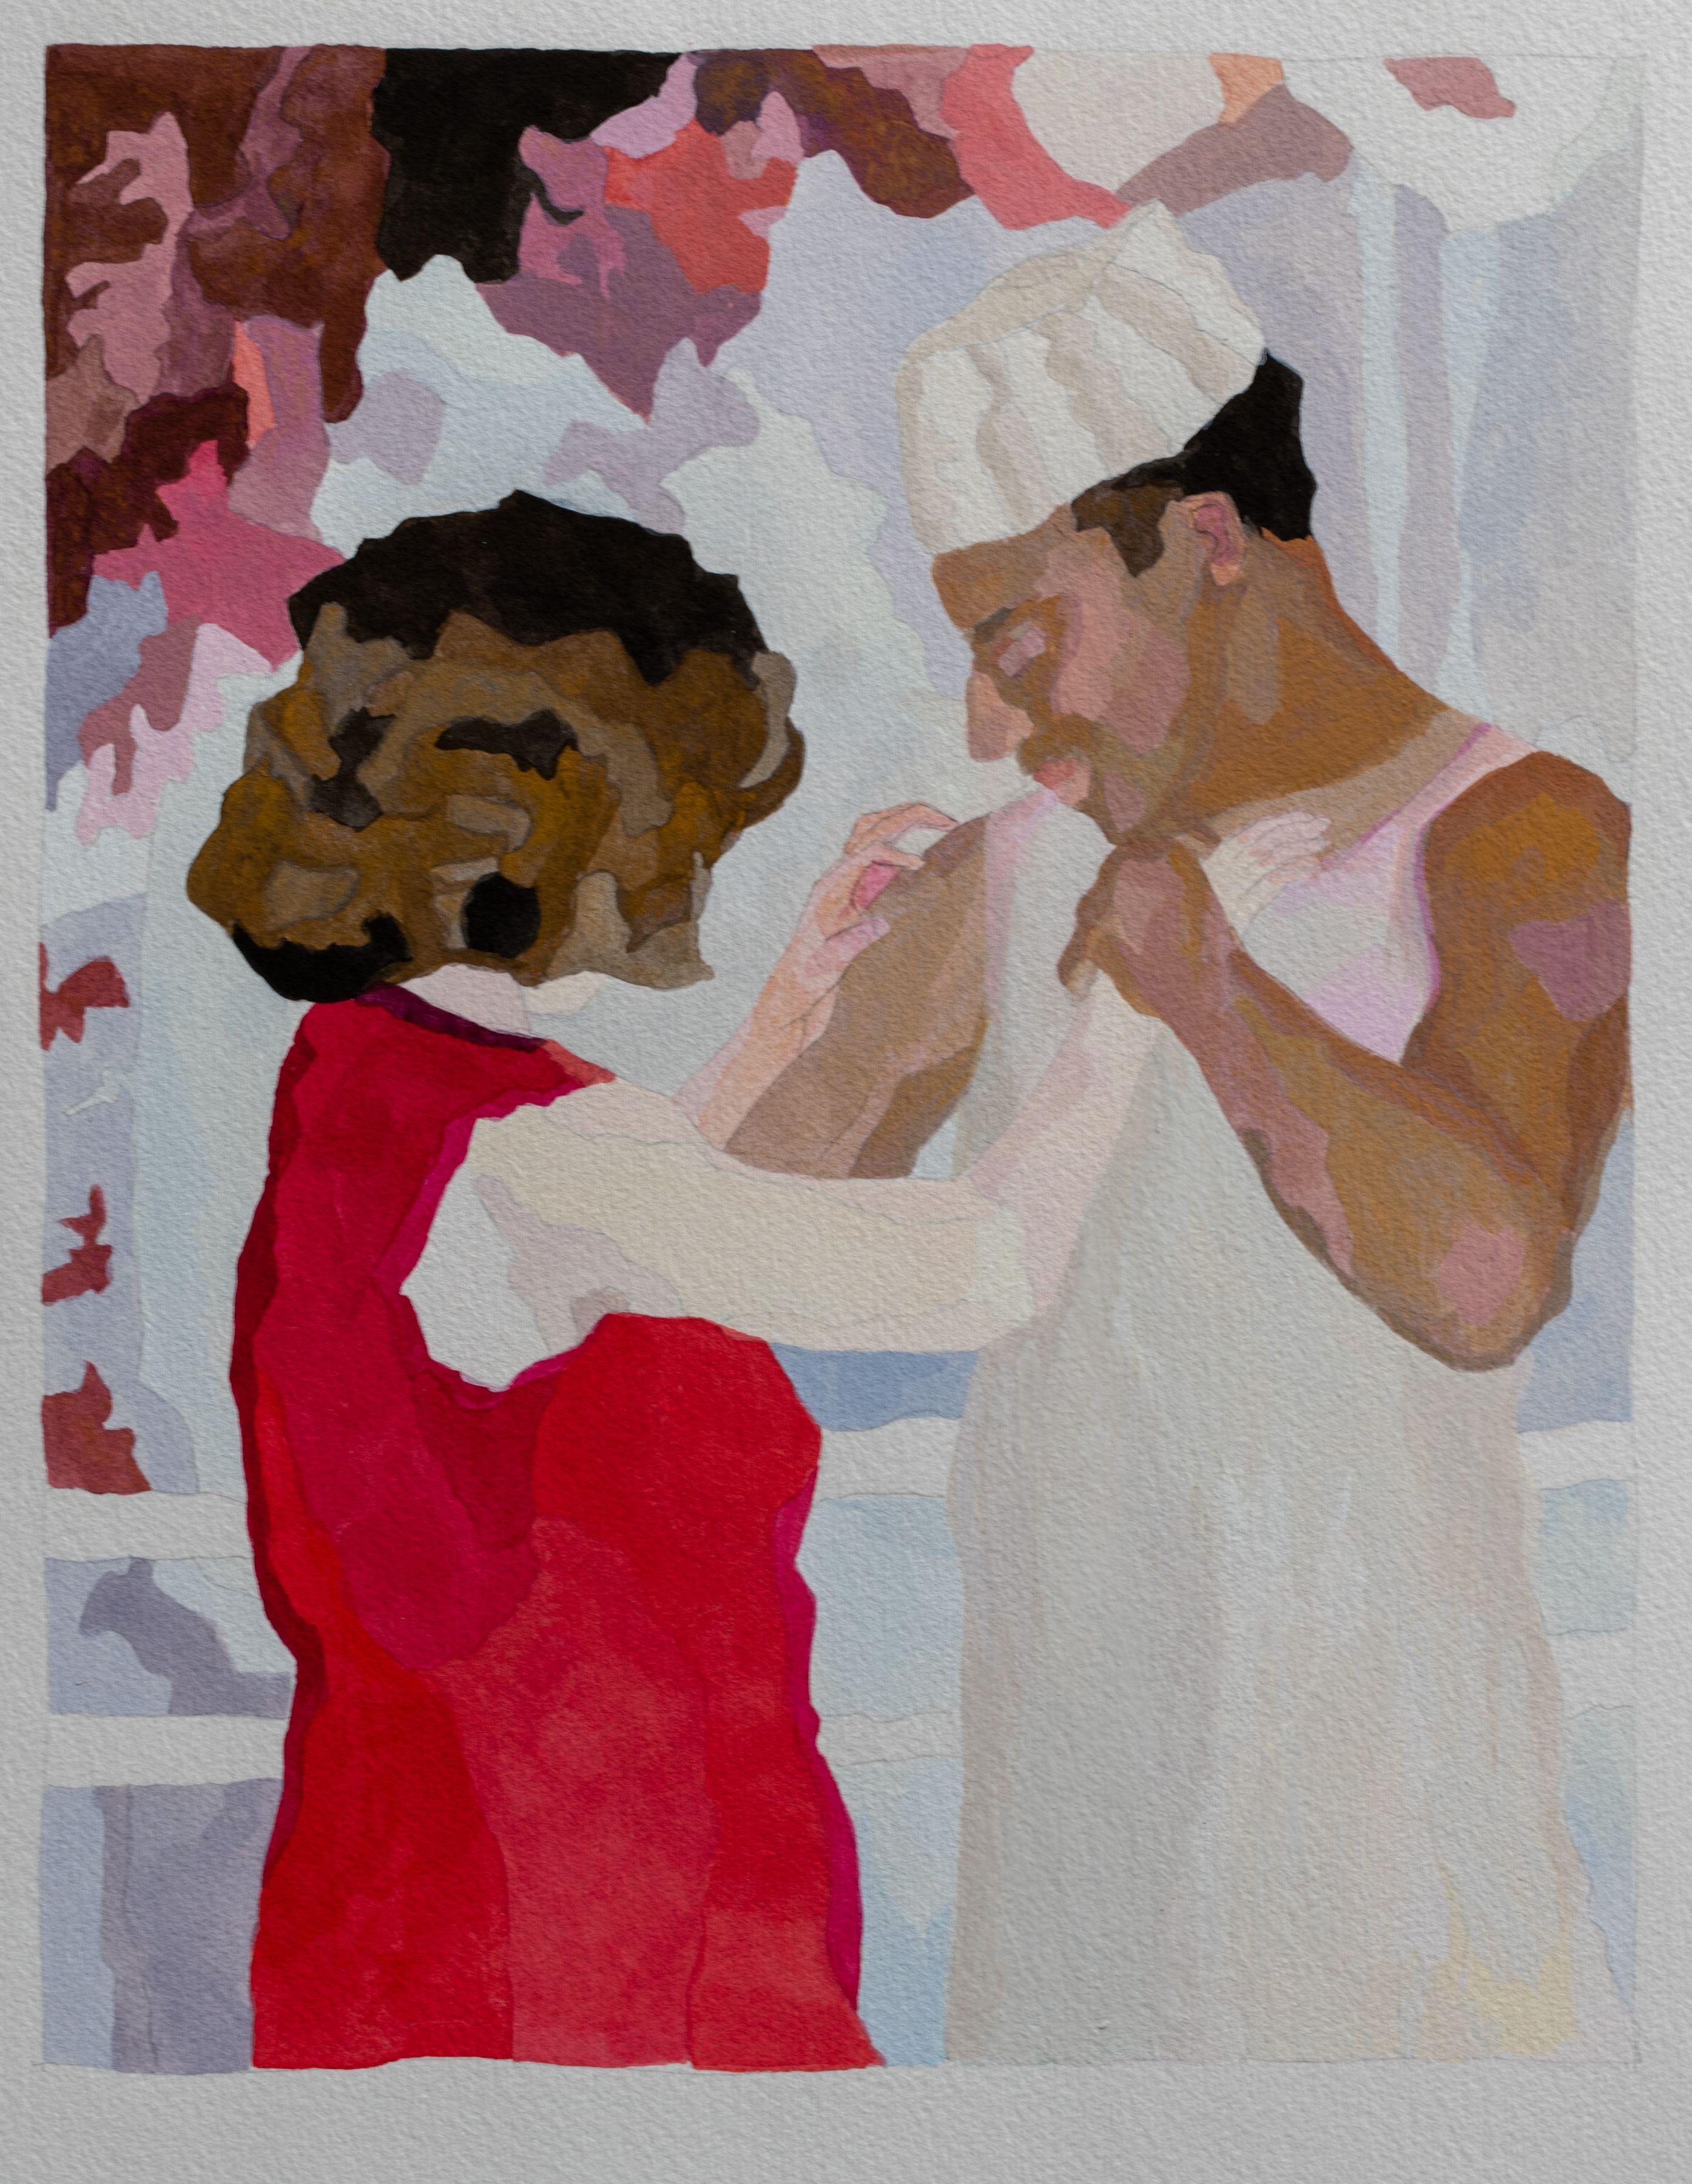 RUTH OWENS, Last Dance (study), 2018